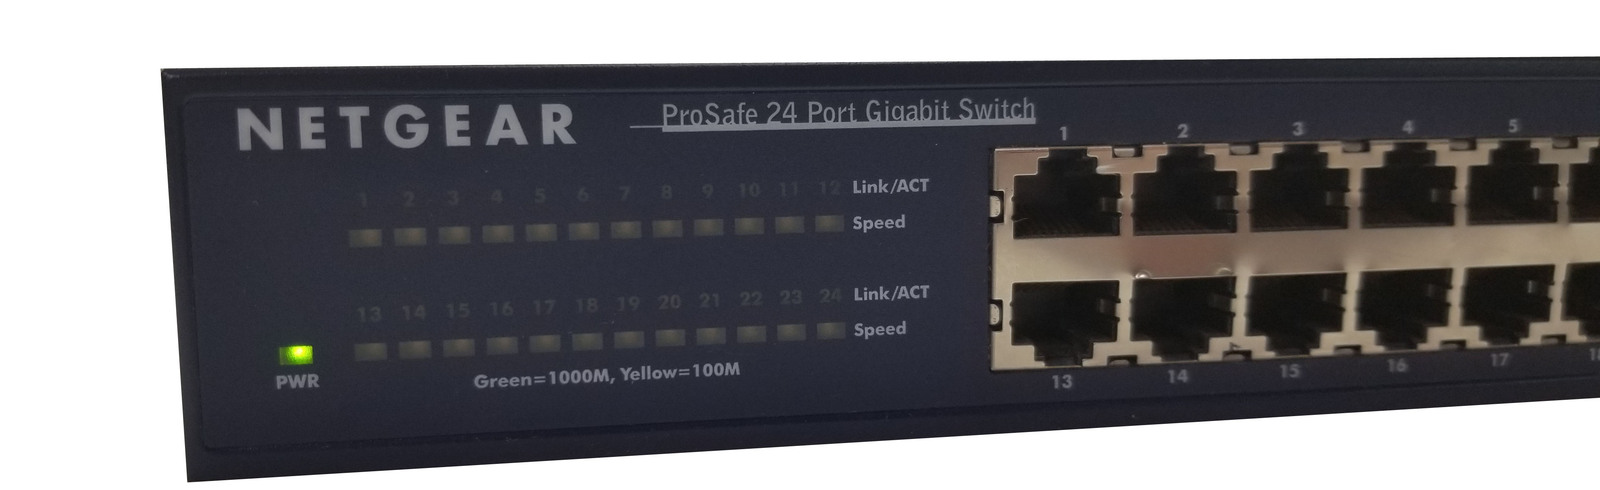 Netgear JGS524 ProSafe 24 Port Gigabit Unmanaged Switch Bin:12